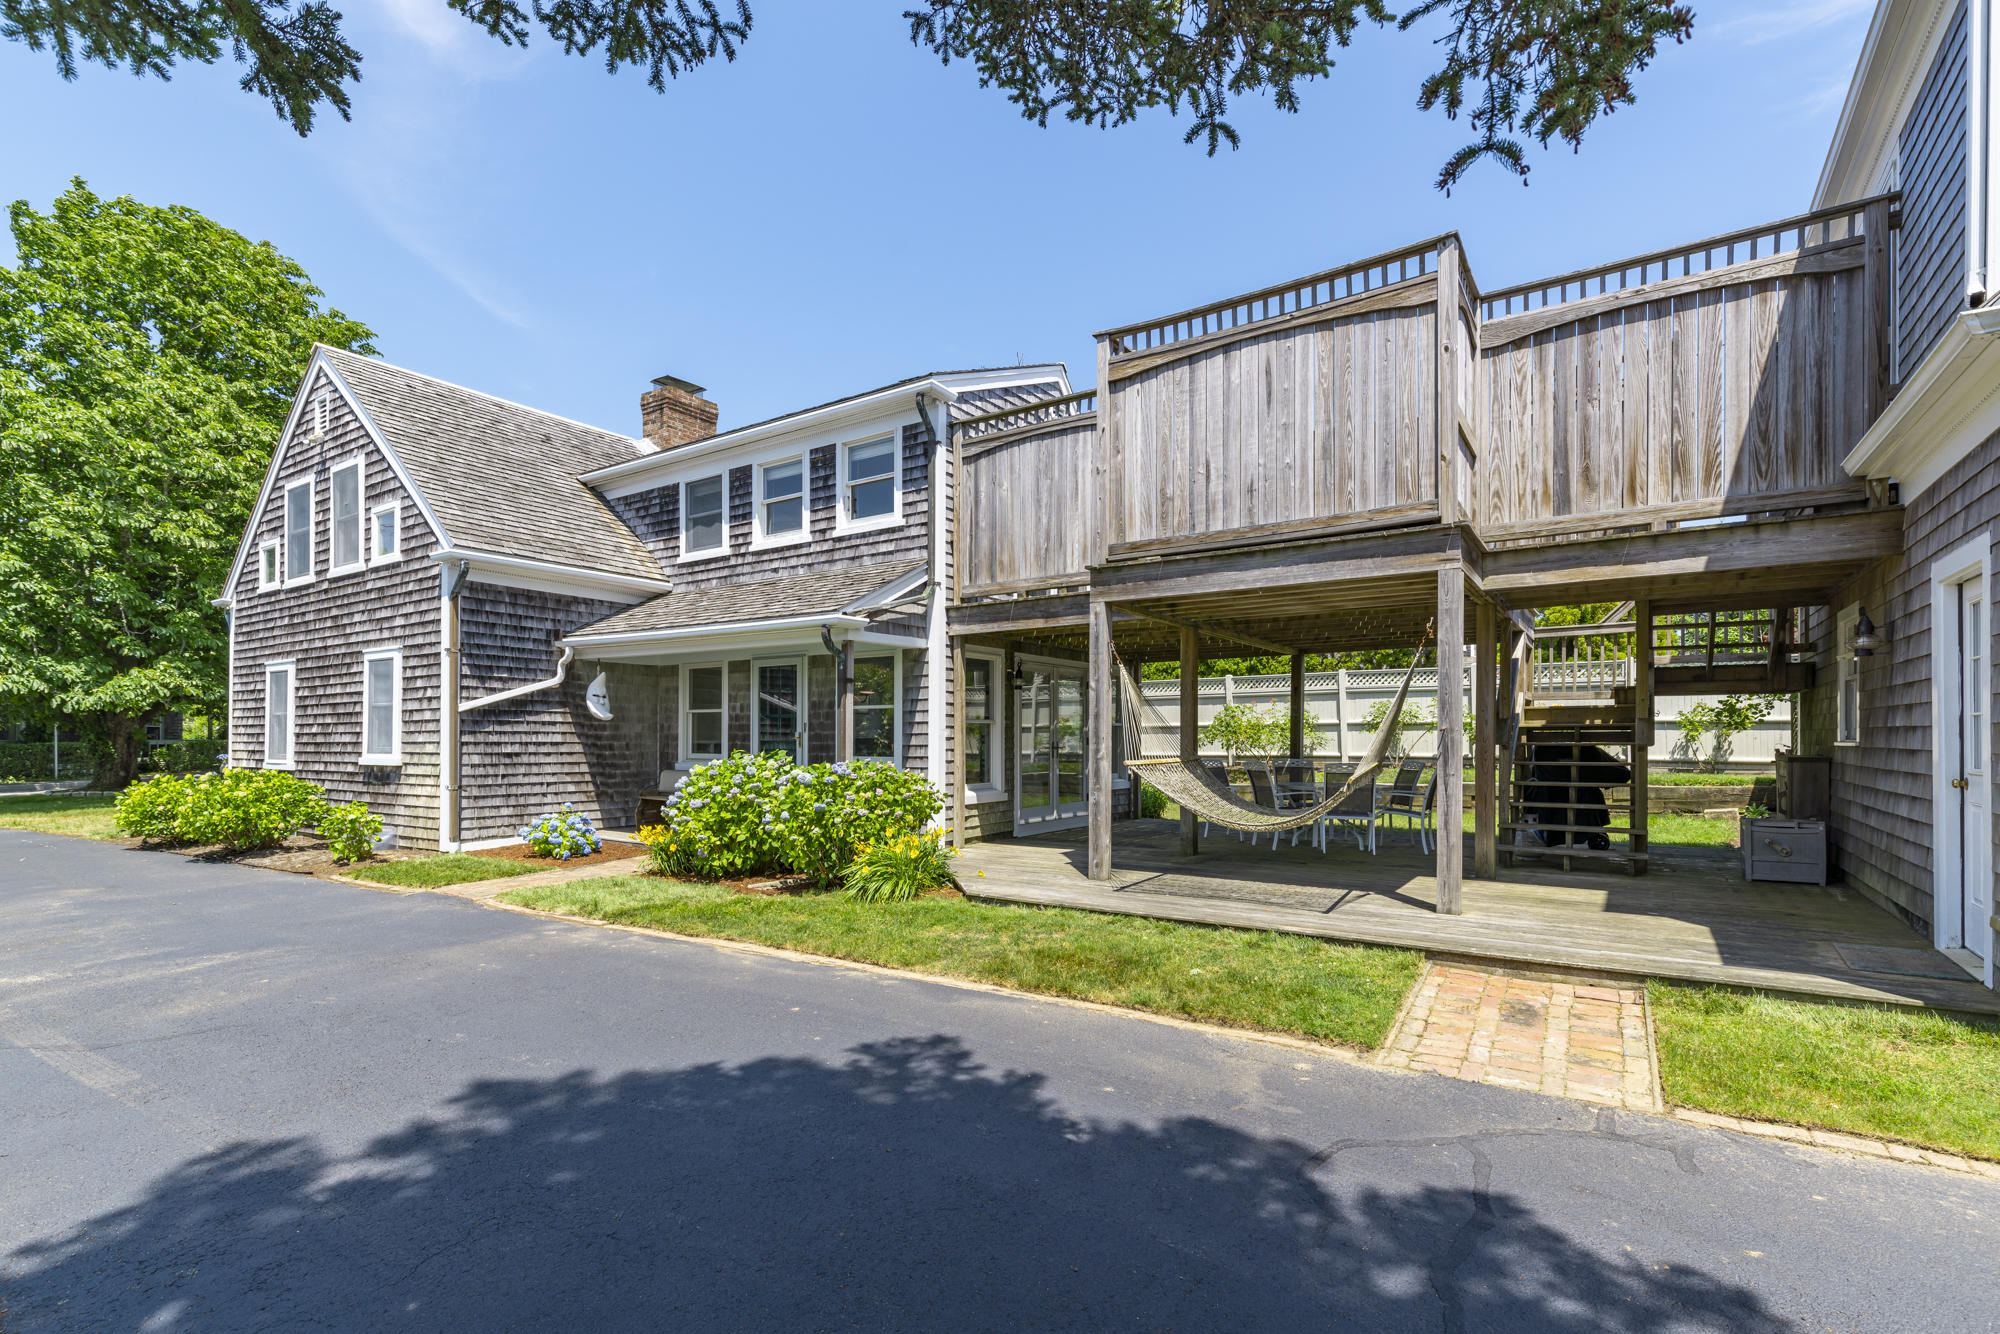 90 Seaview Street, Chatham, MA  02633 - slide 4